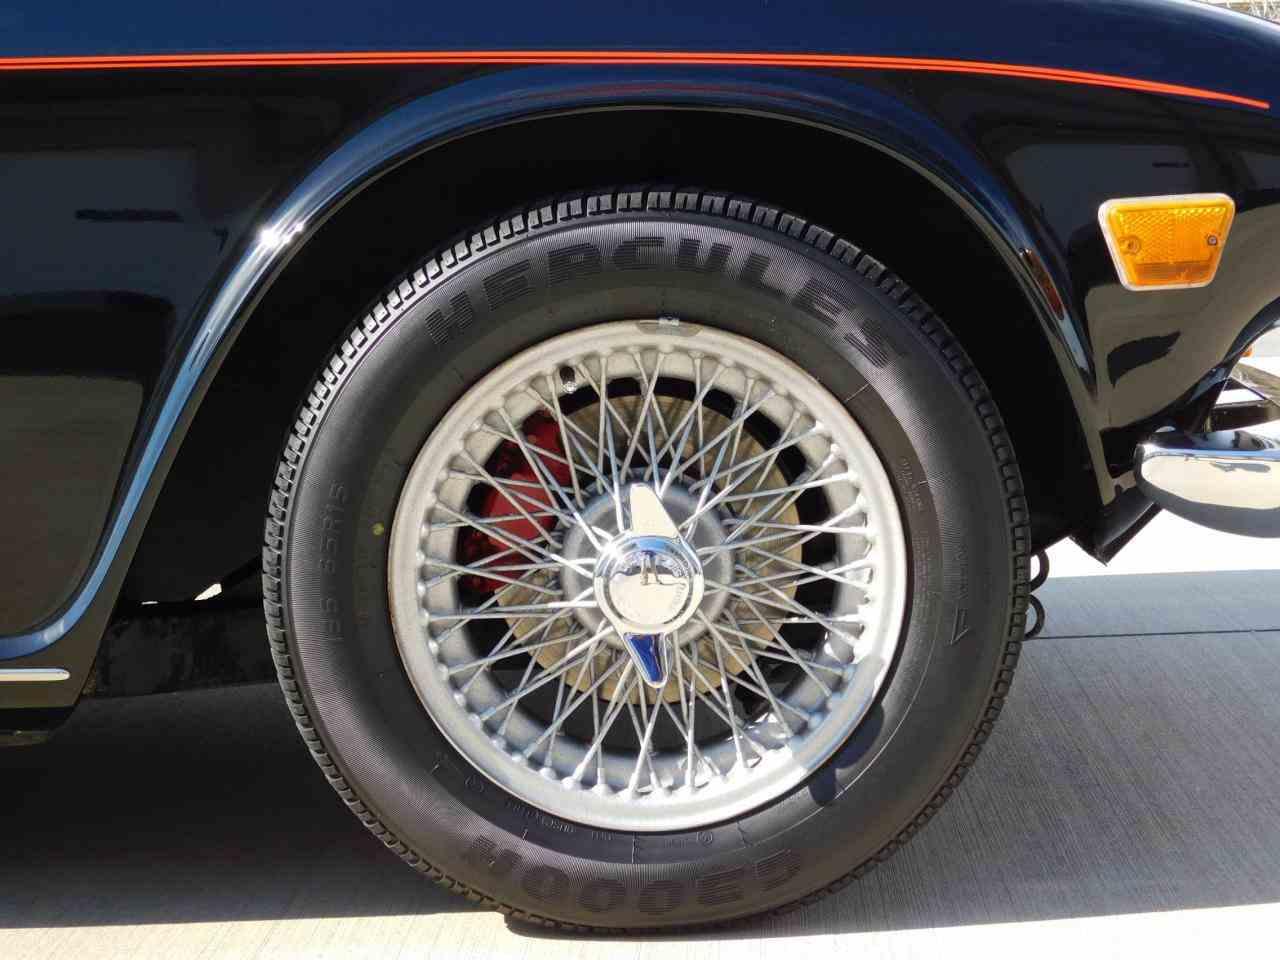 1969 Triumph TR6 for Sale | ClassicCars.com | CC-1037692